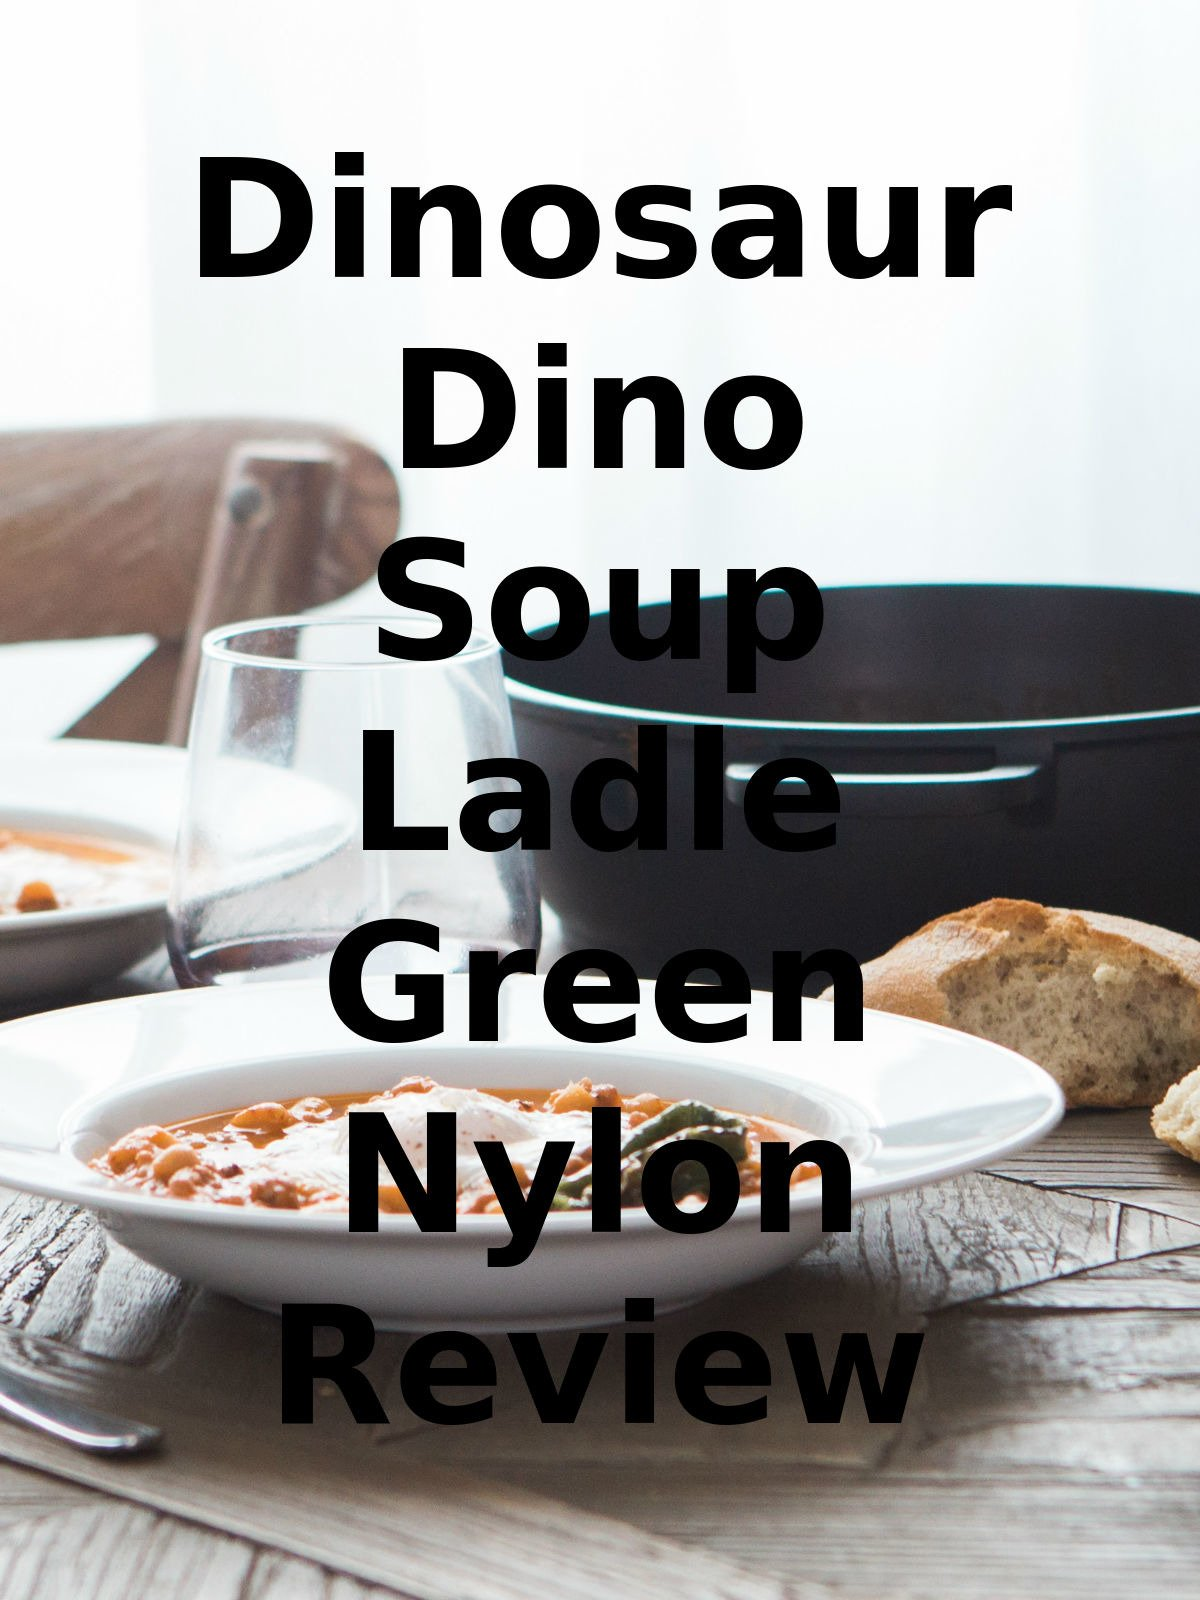 Review: Dinosaur Dino Soup Ladle Green Nylon Review on Amazon Prime Video UK